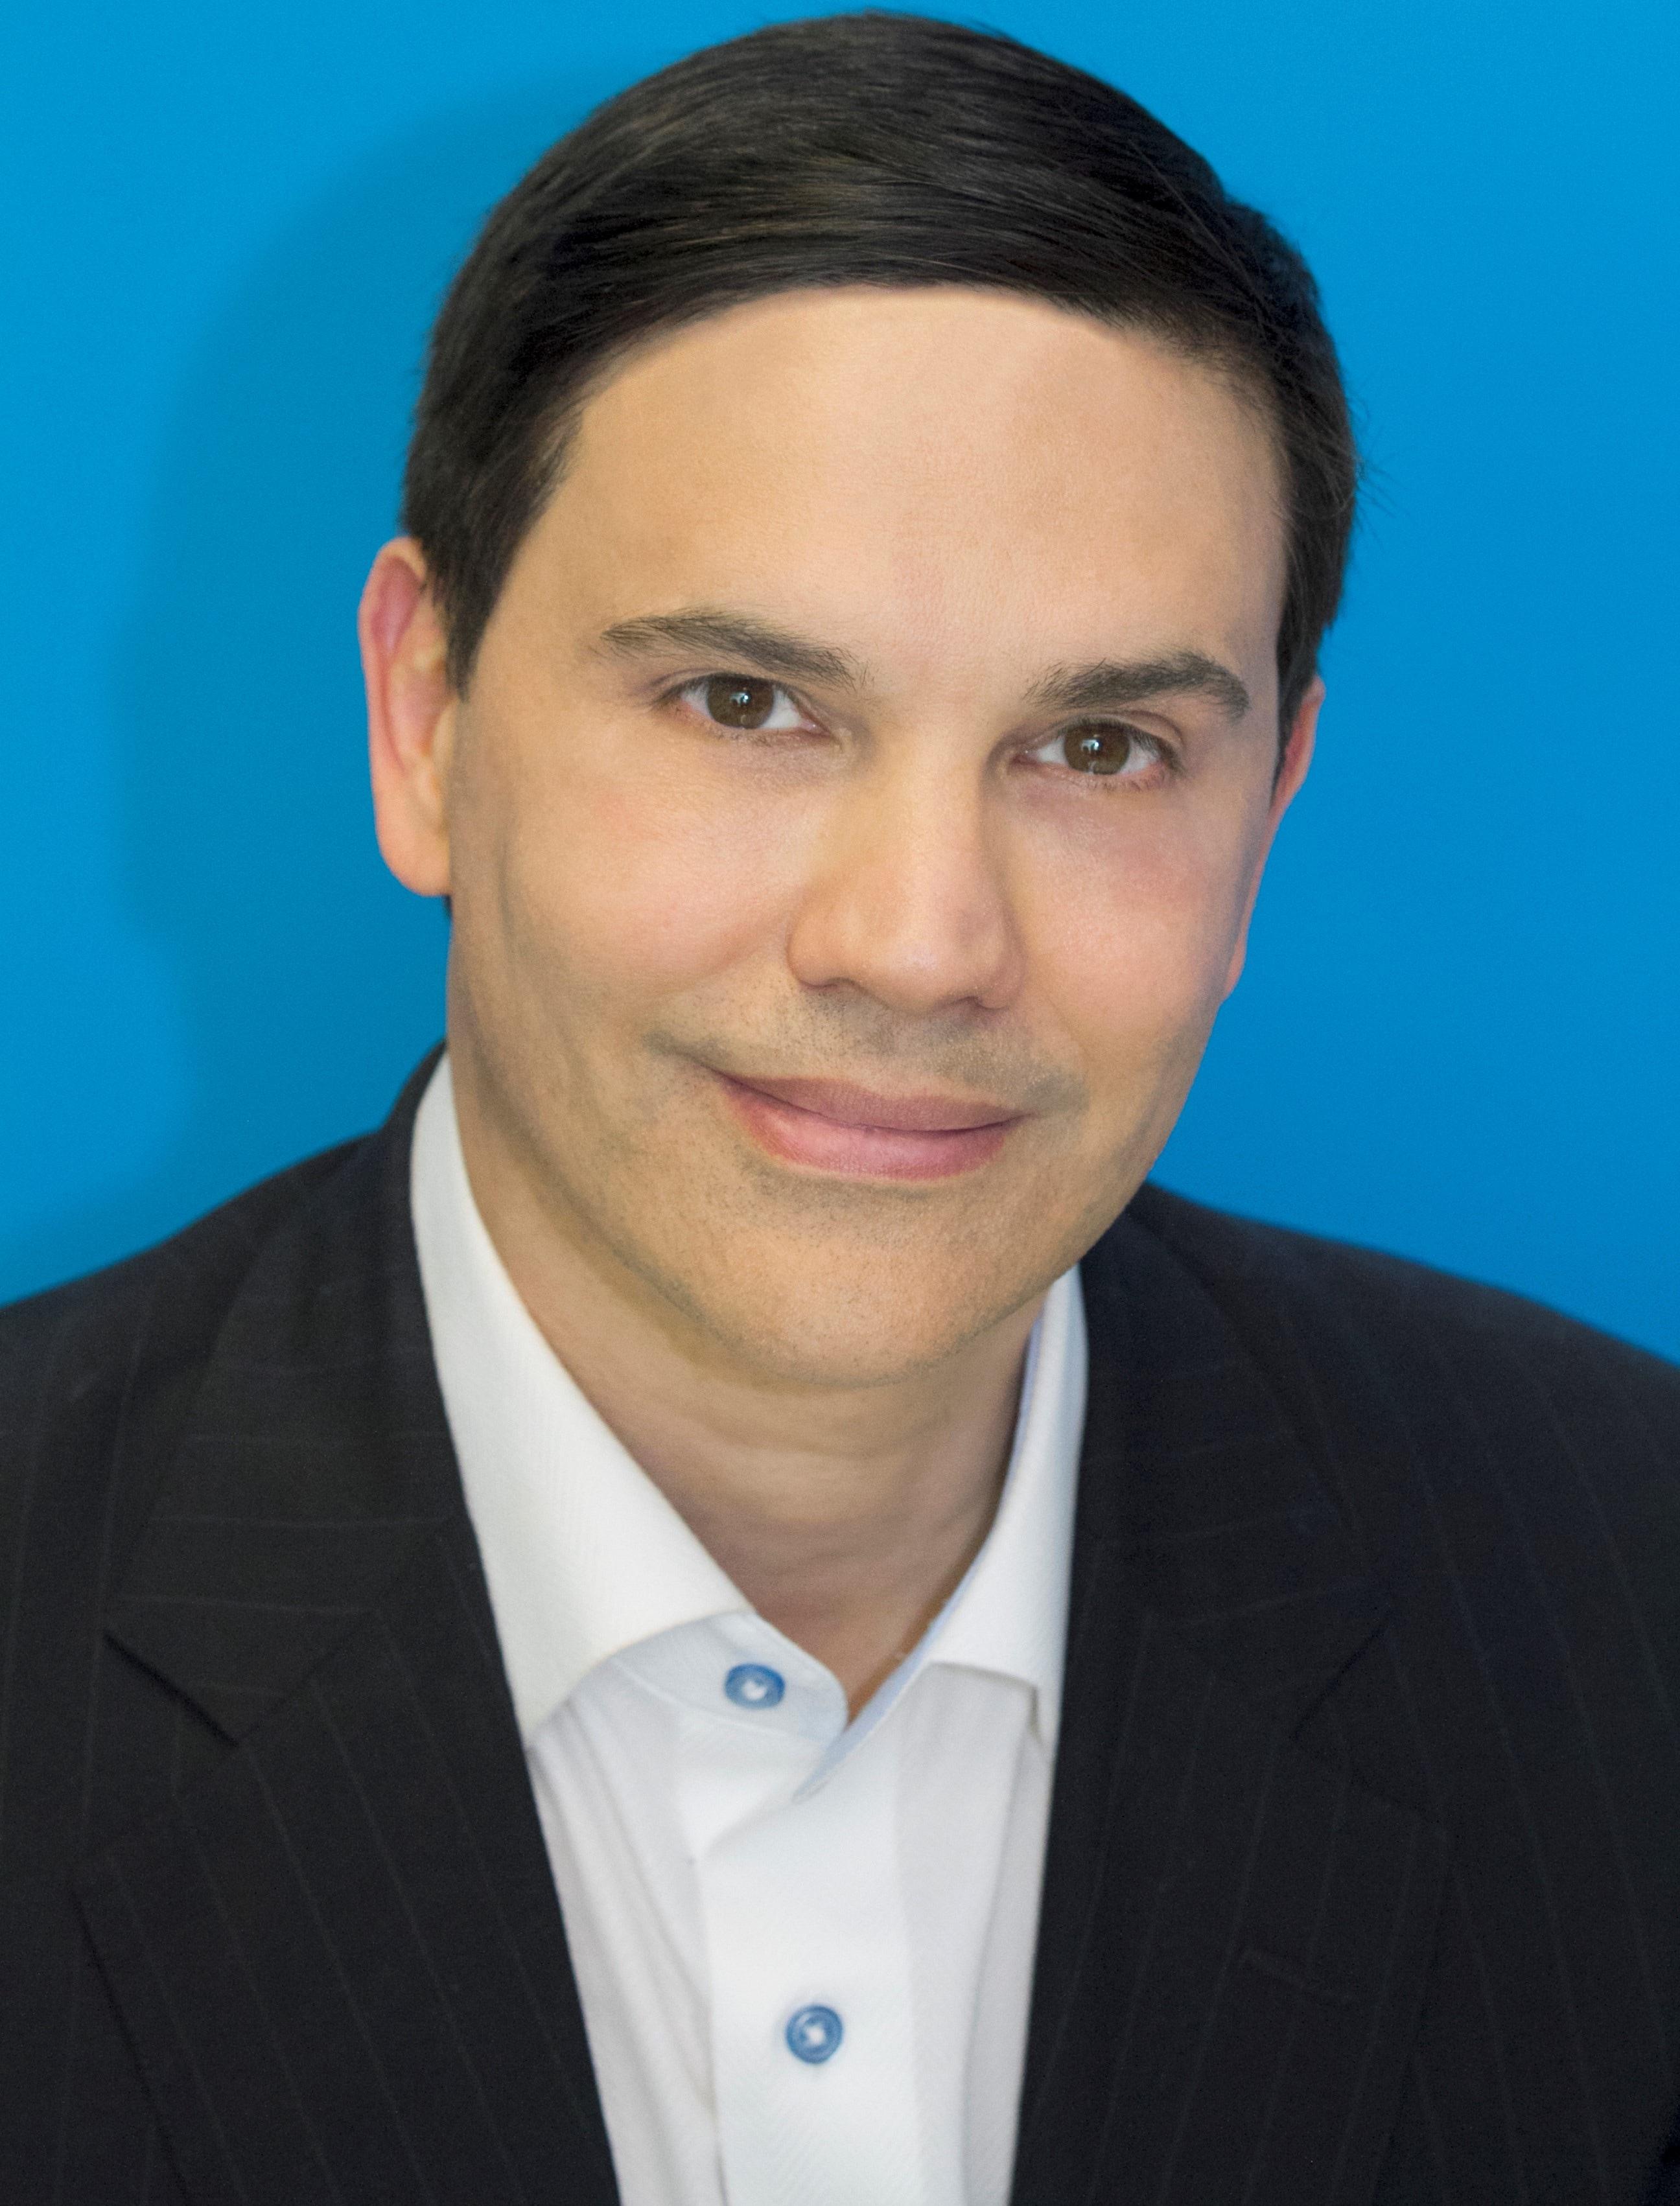 Alexander Villares, MD Plastic Surgery